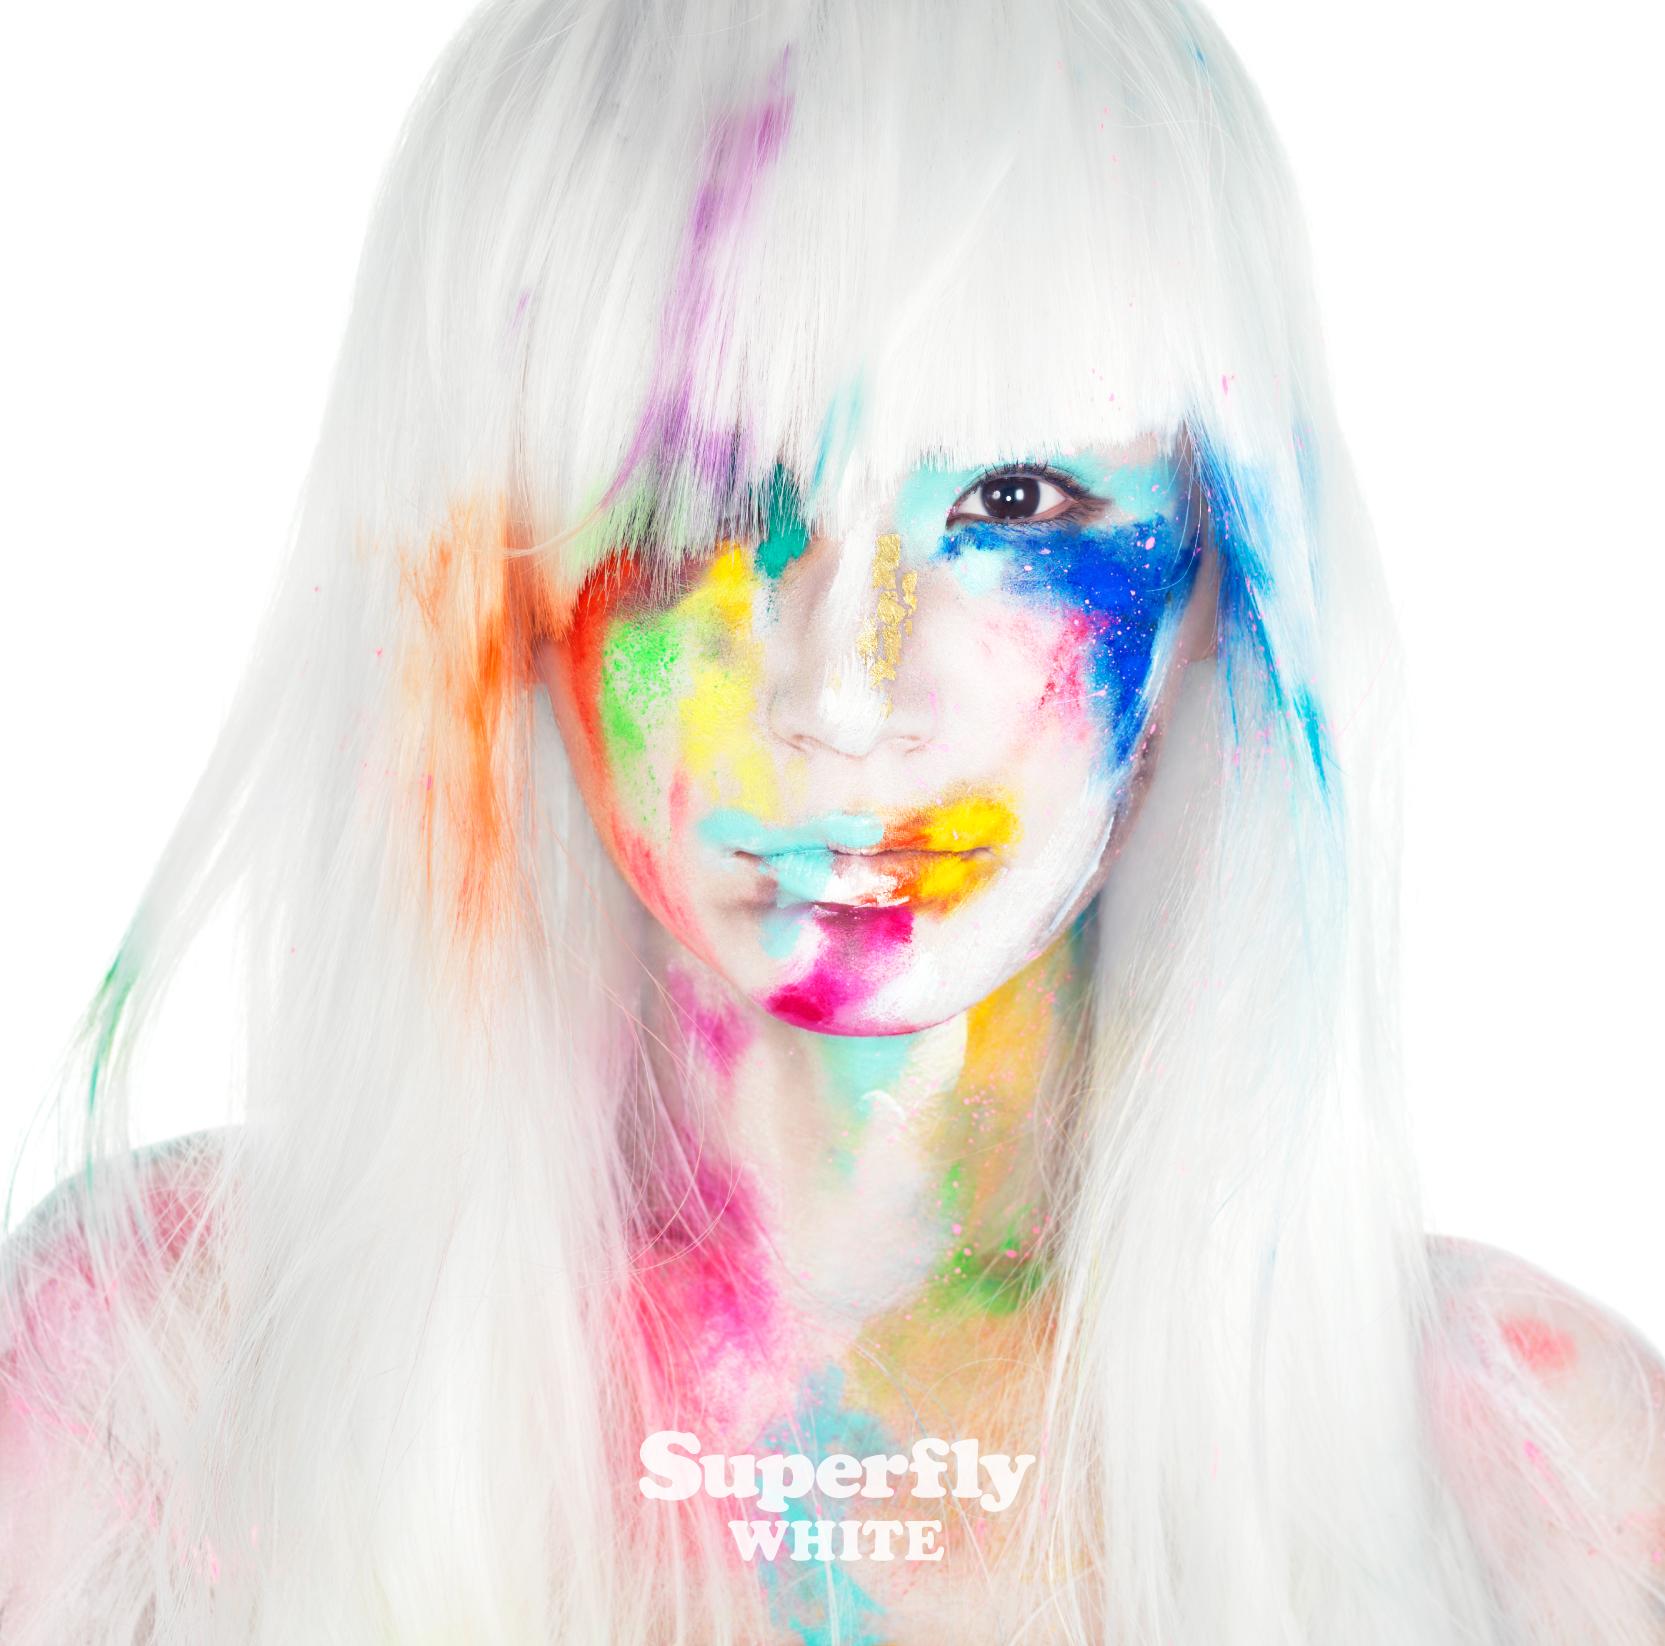 Superfly、「WHITE」&カラフルなニューALジャケットをお披露目